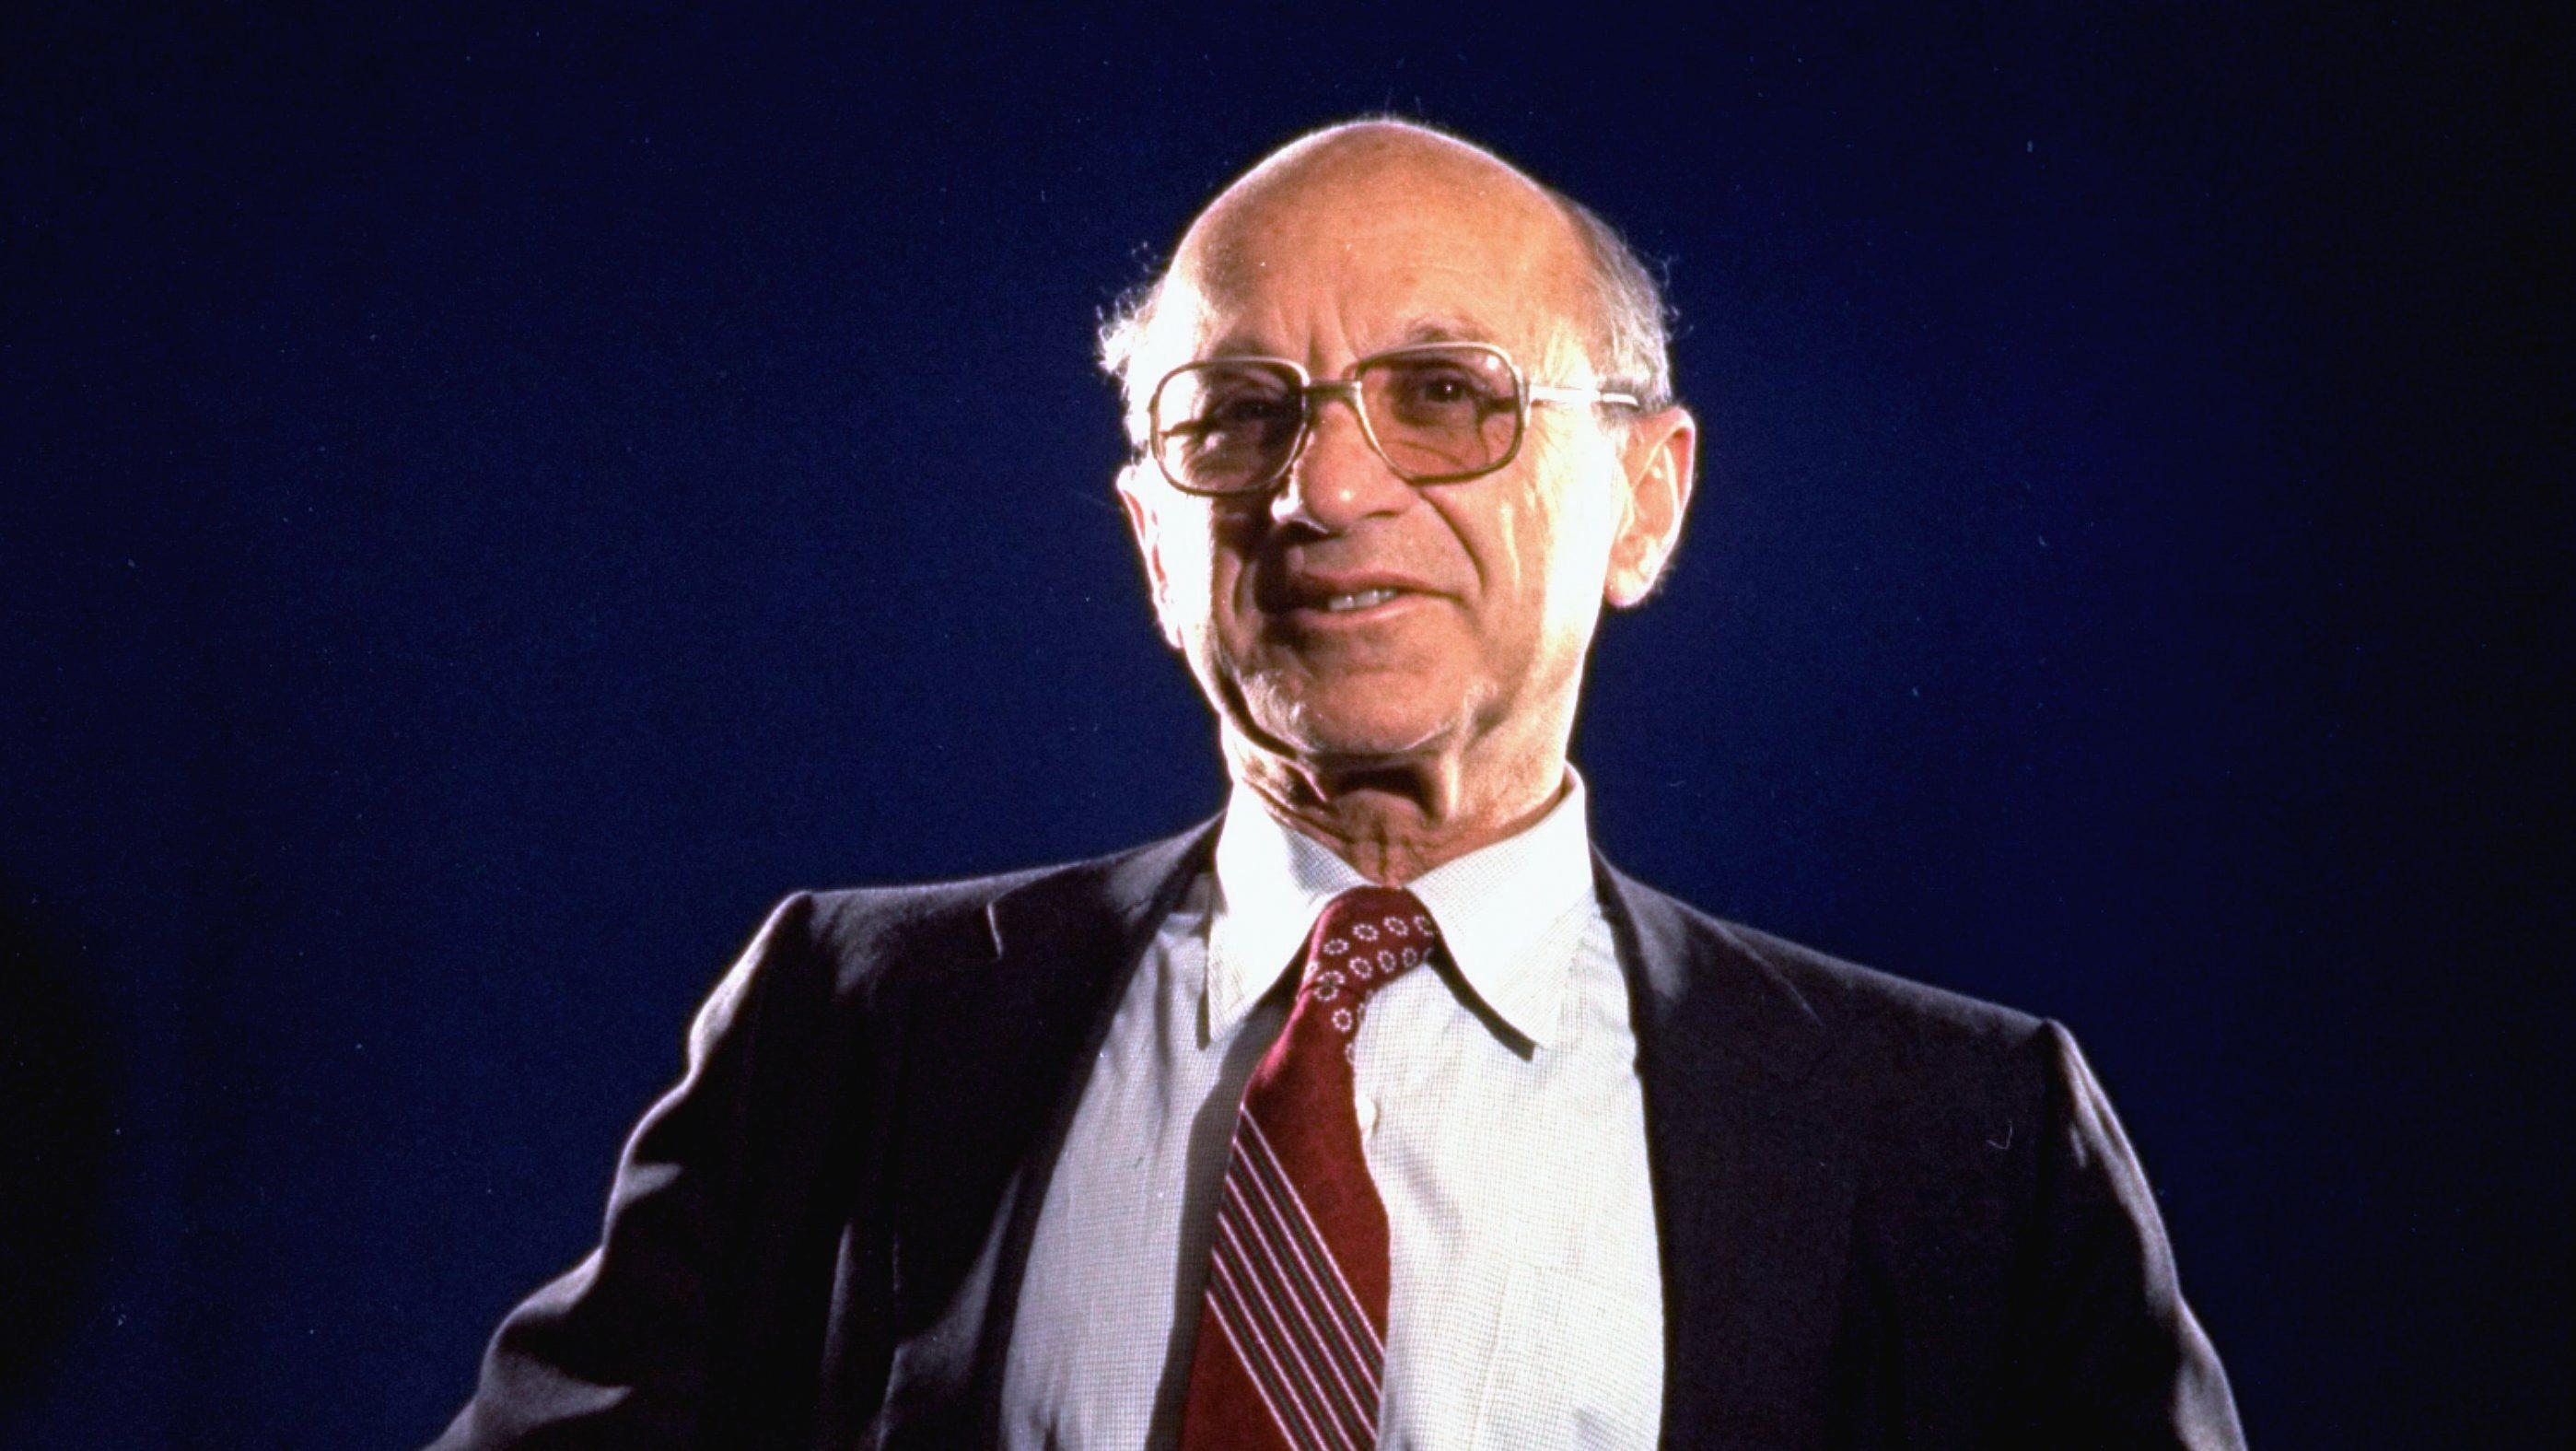 A photo of economist Milton Friedman